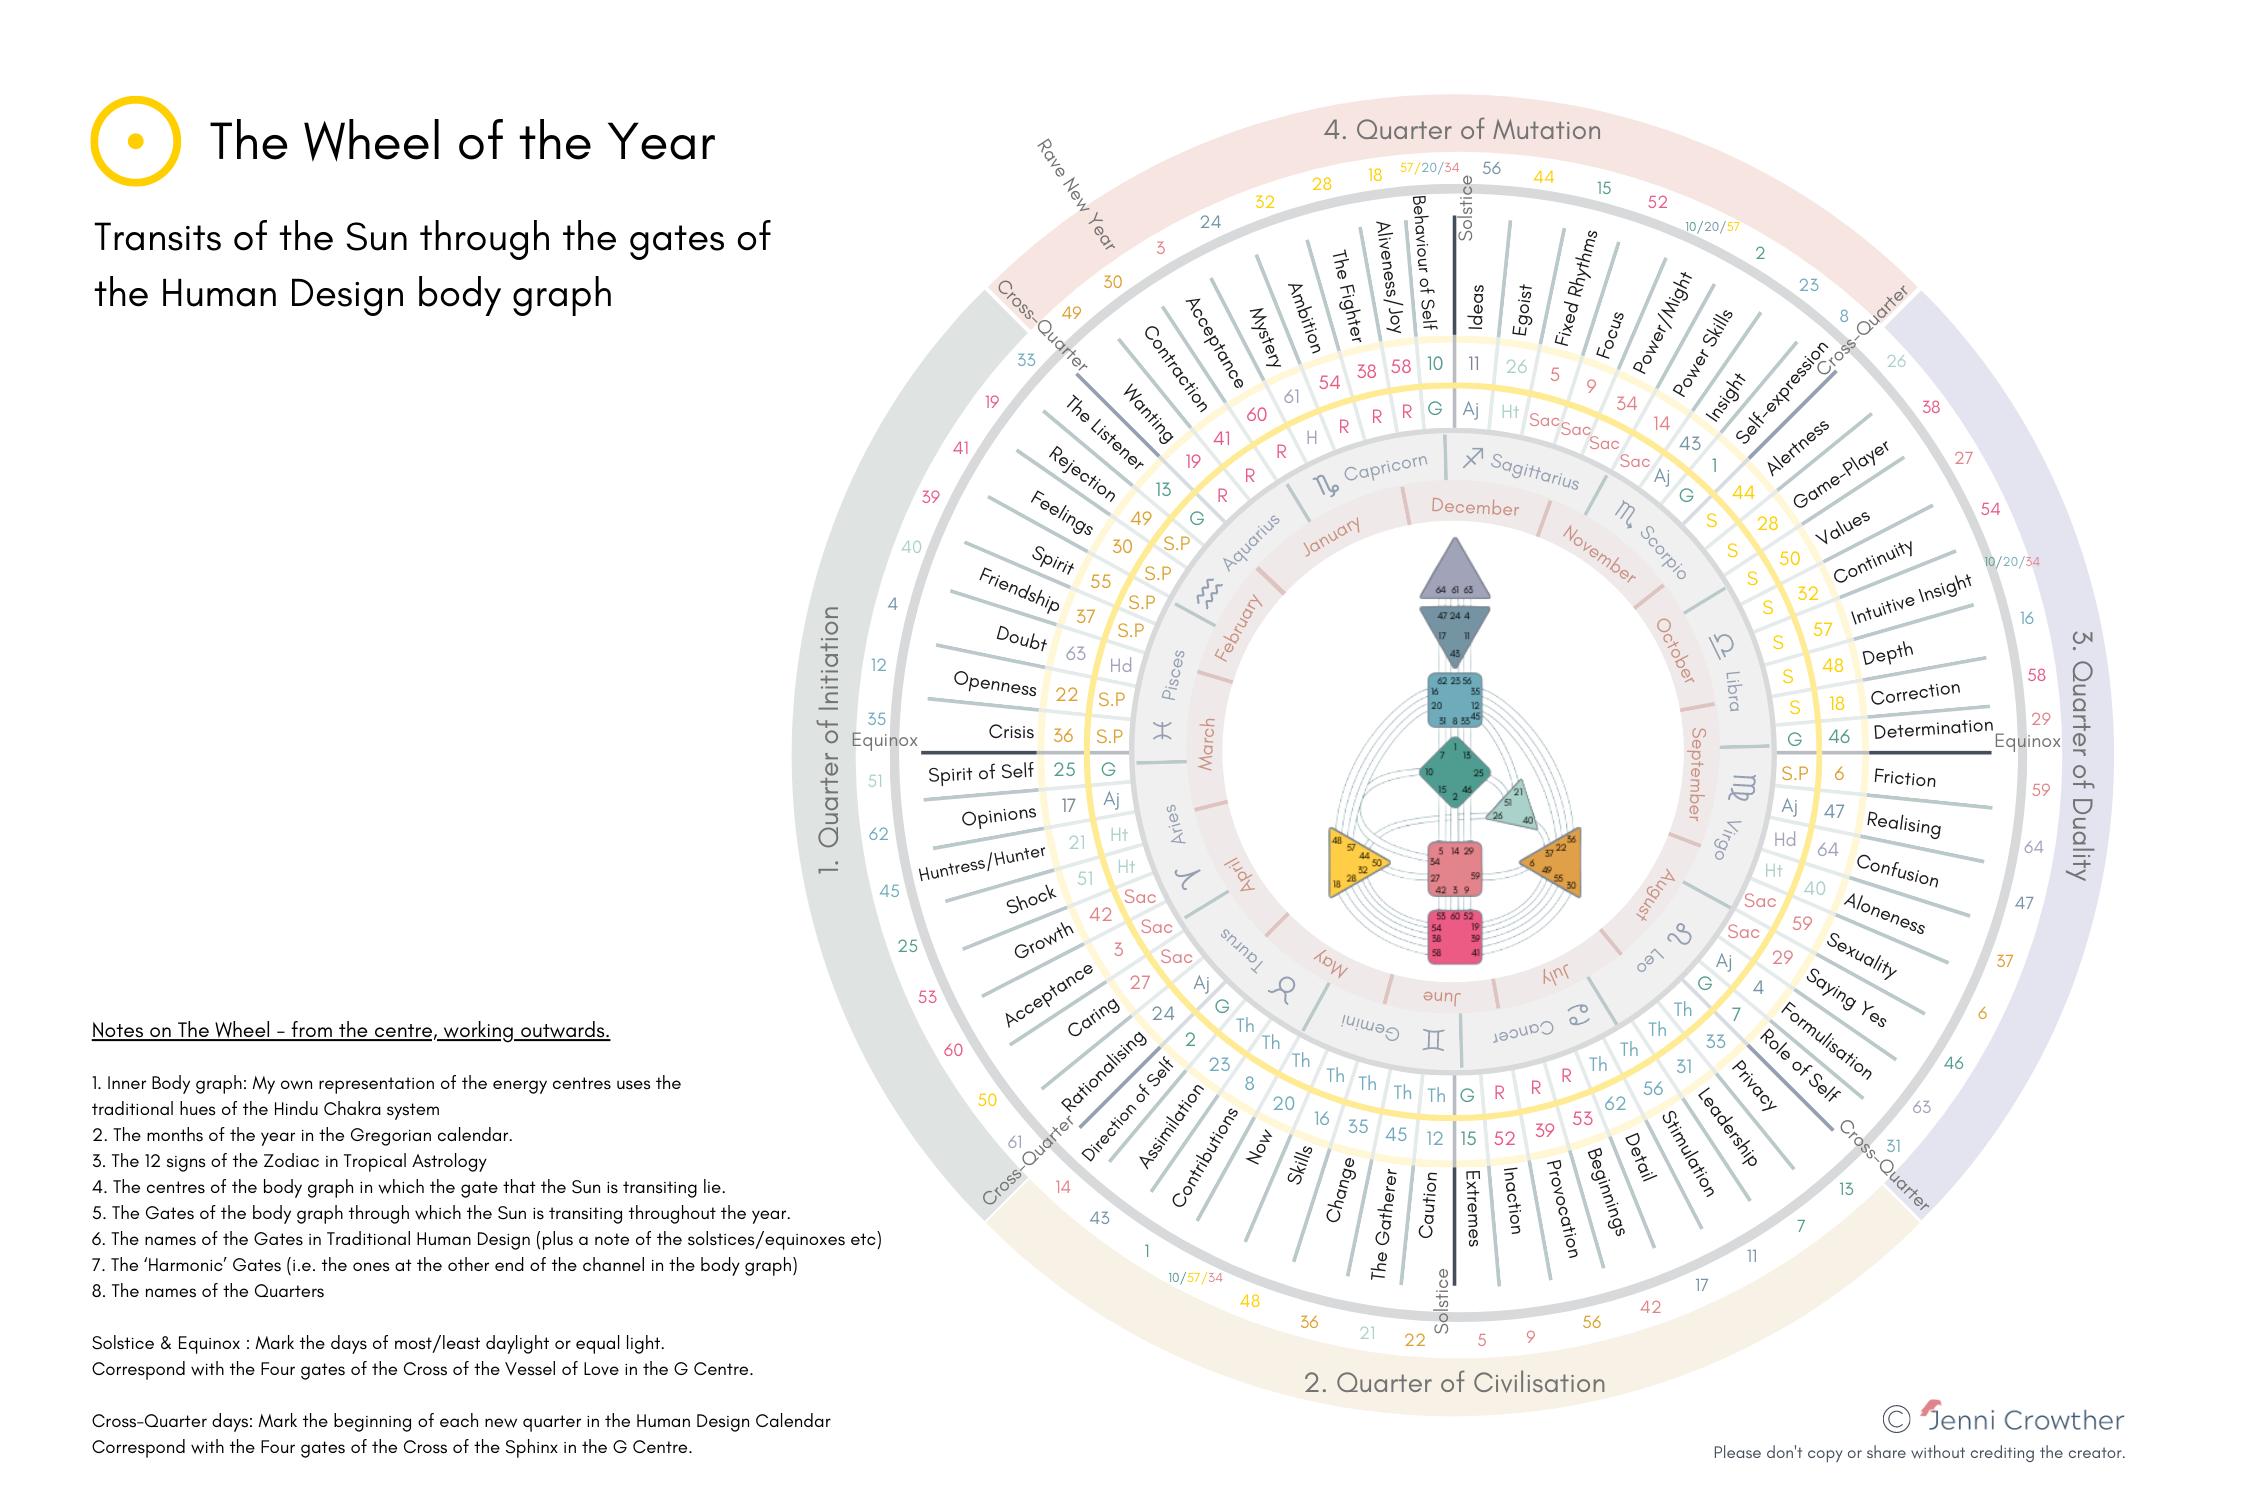 Human Design wheel of the year